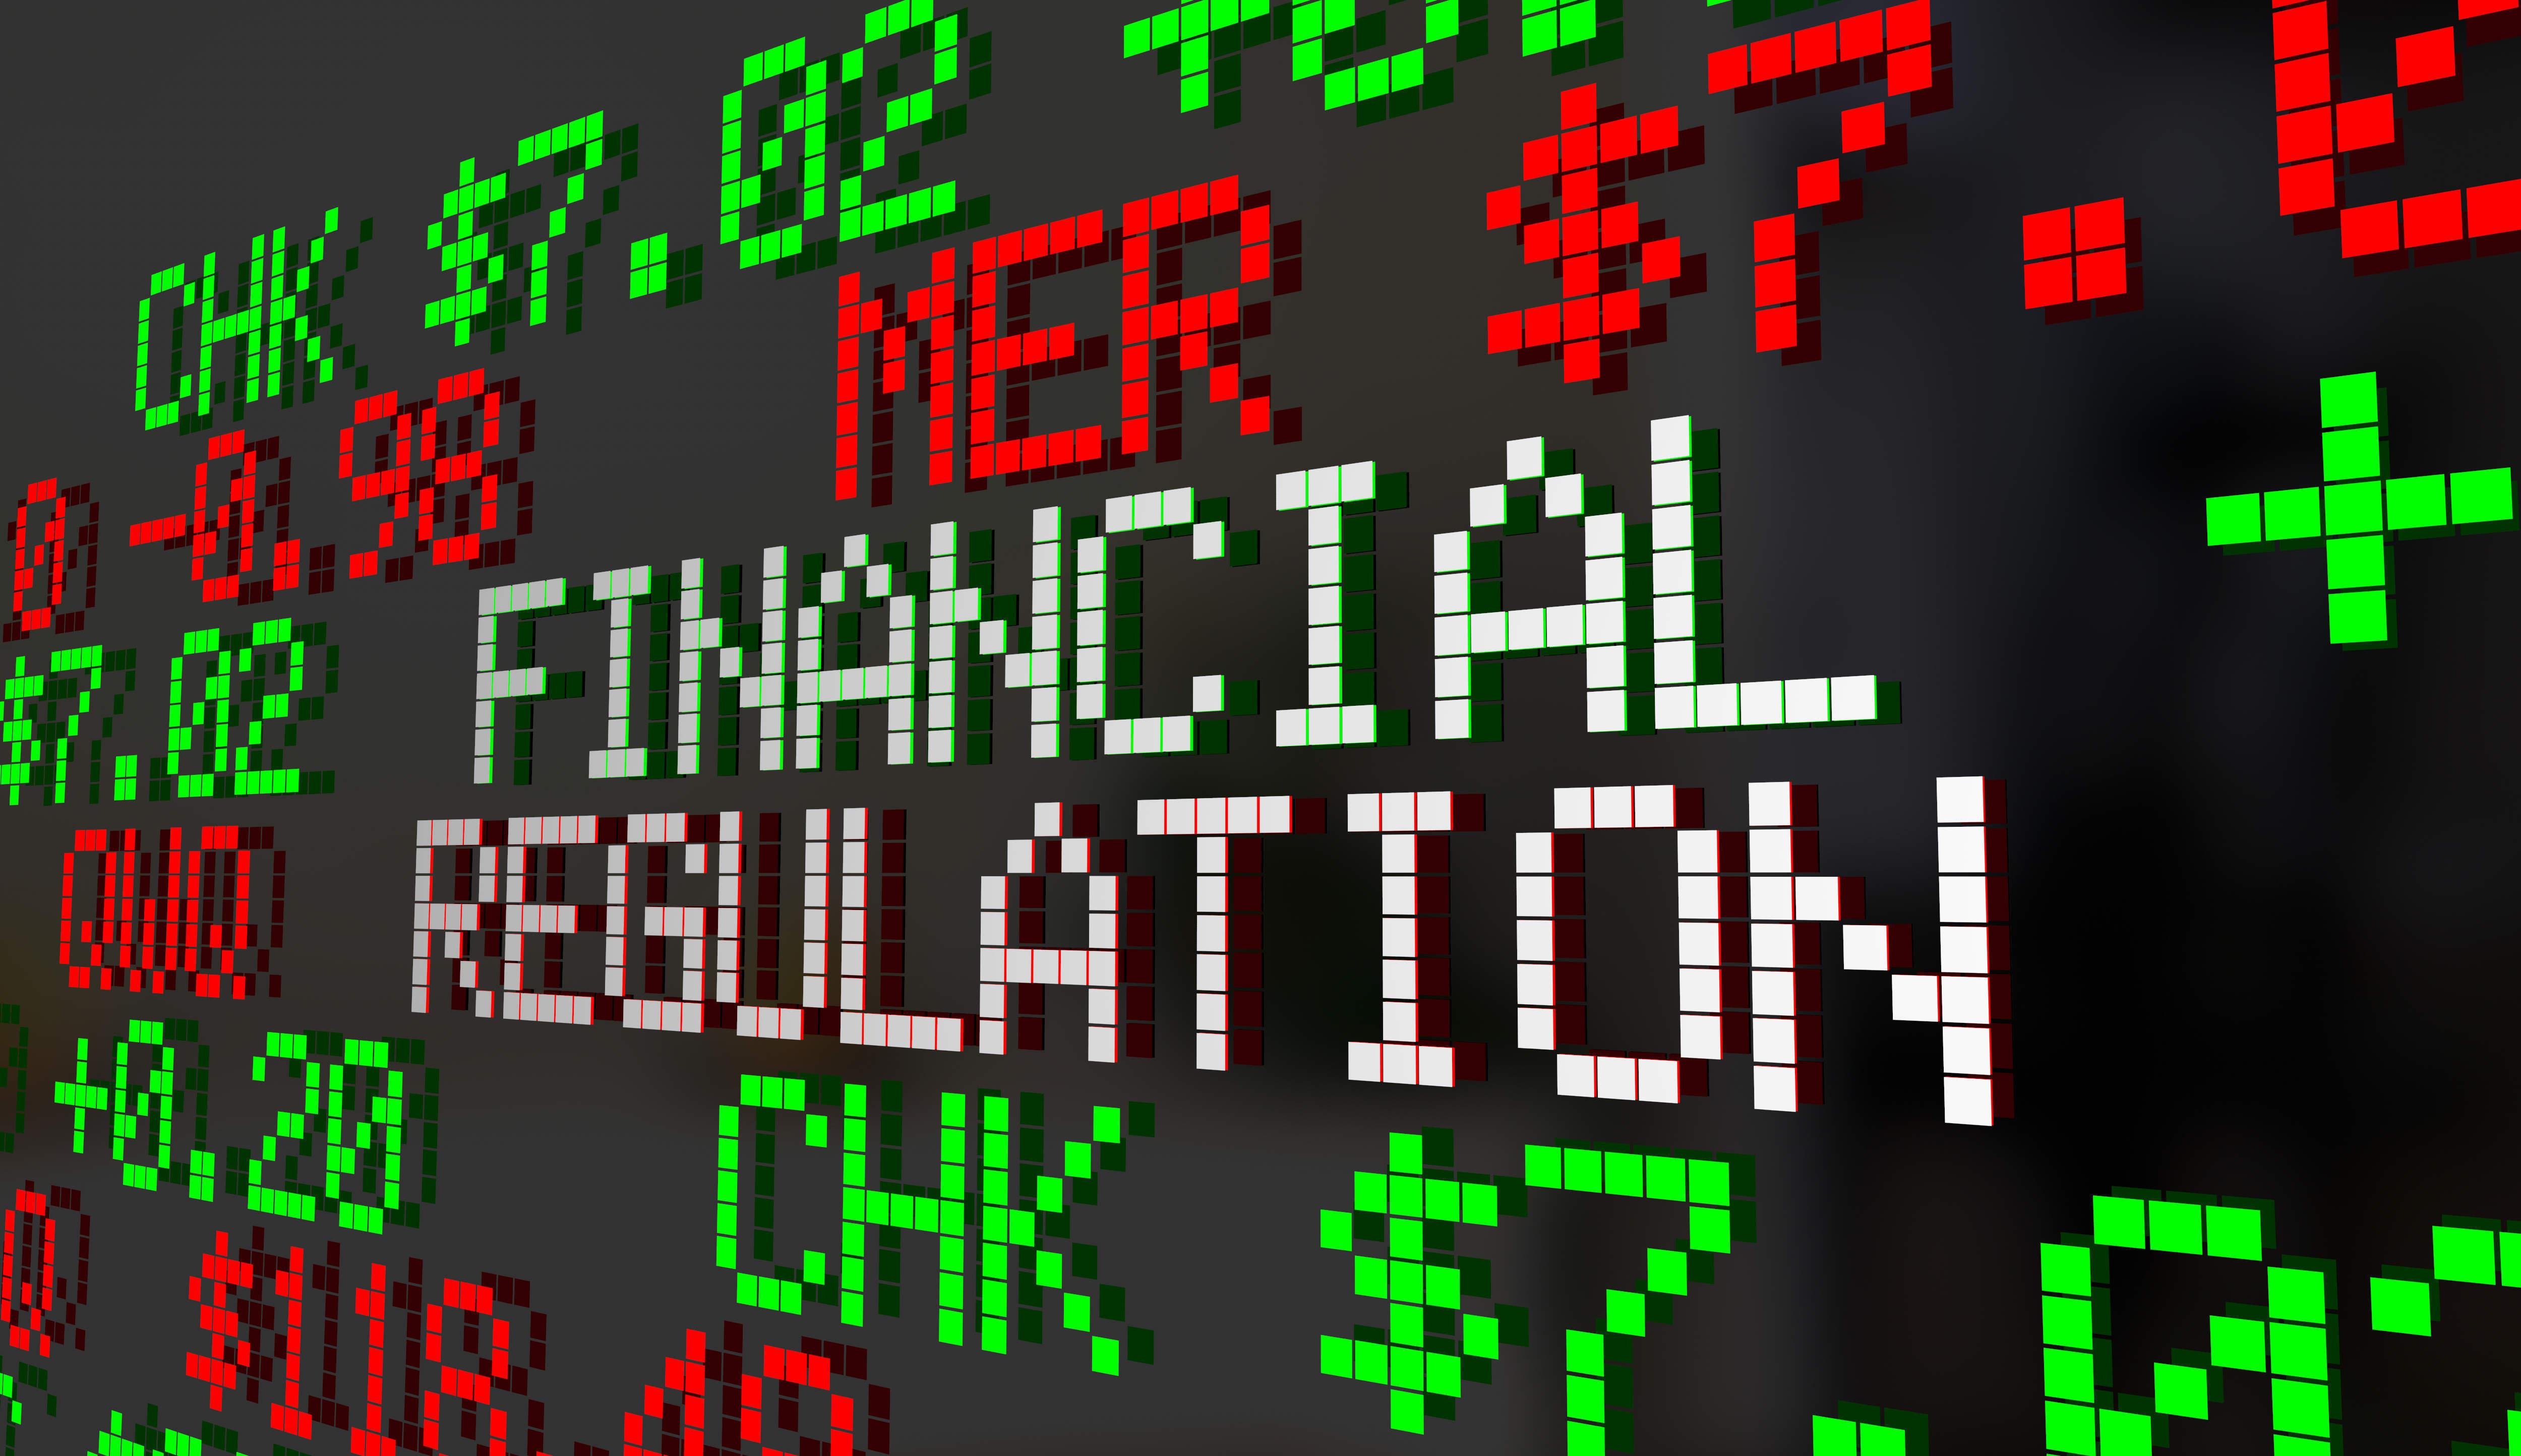 Don't get rid of US Dodd-Frank banking regulations, says UK financial watchdog chief